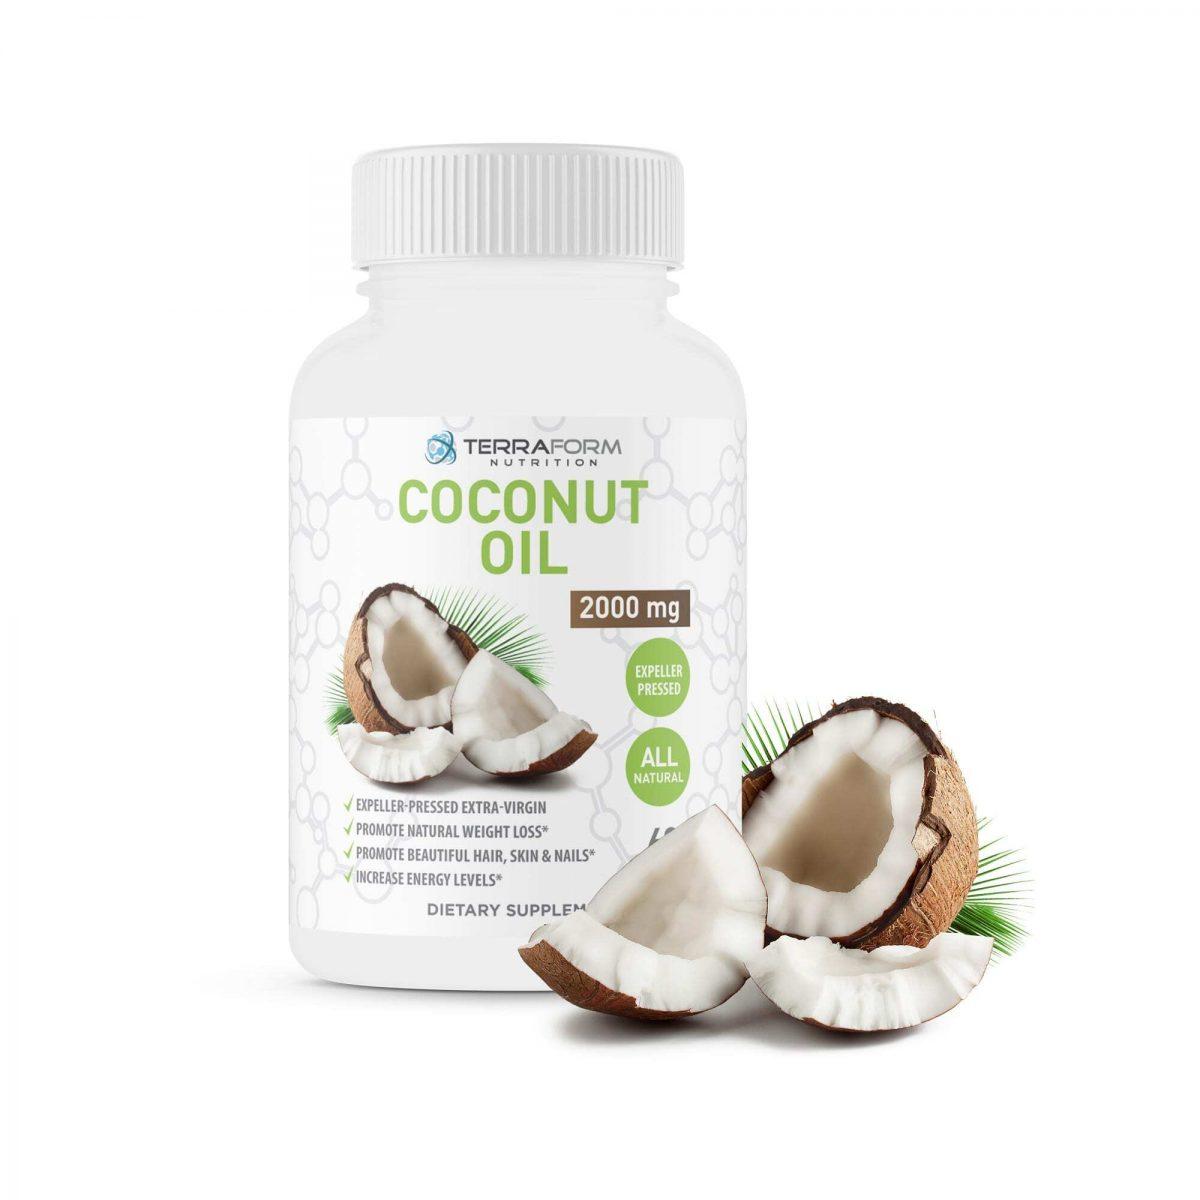 Coconut Oil Capsules - Extra Virgin Expeller-Pressed – 2000mg – 60 Softgels - TerraForm Nutrition-3289